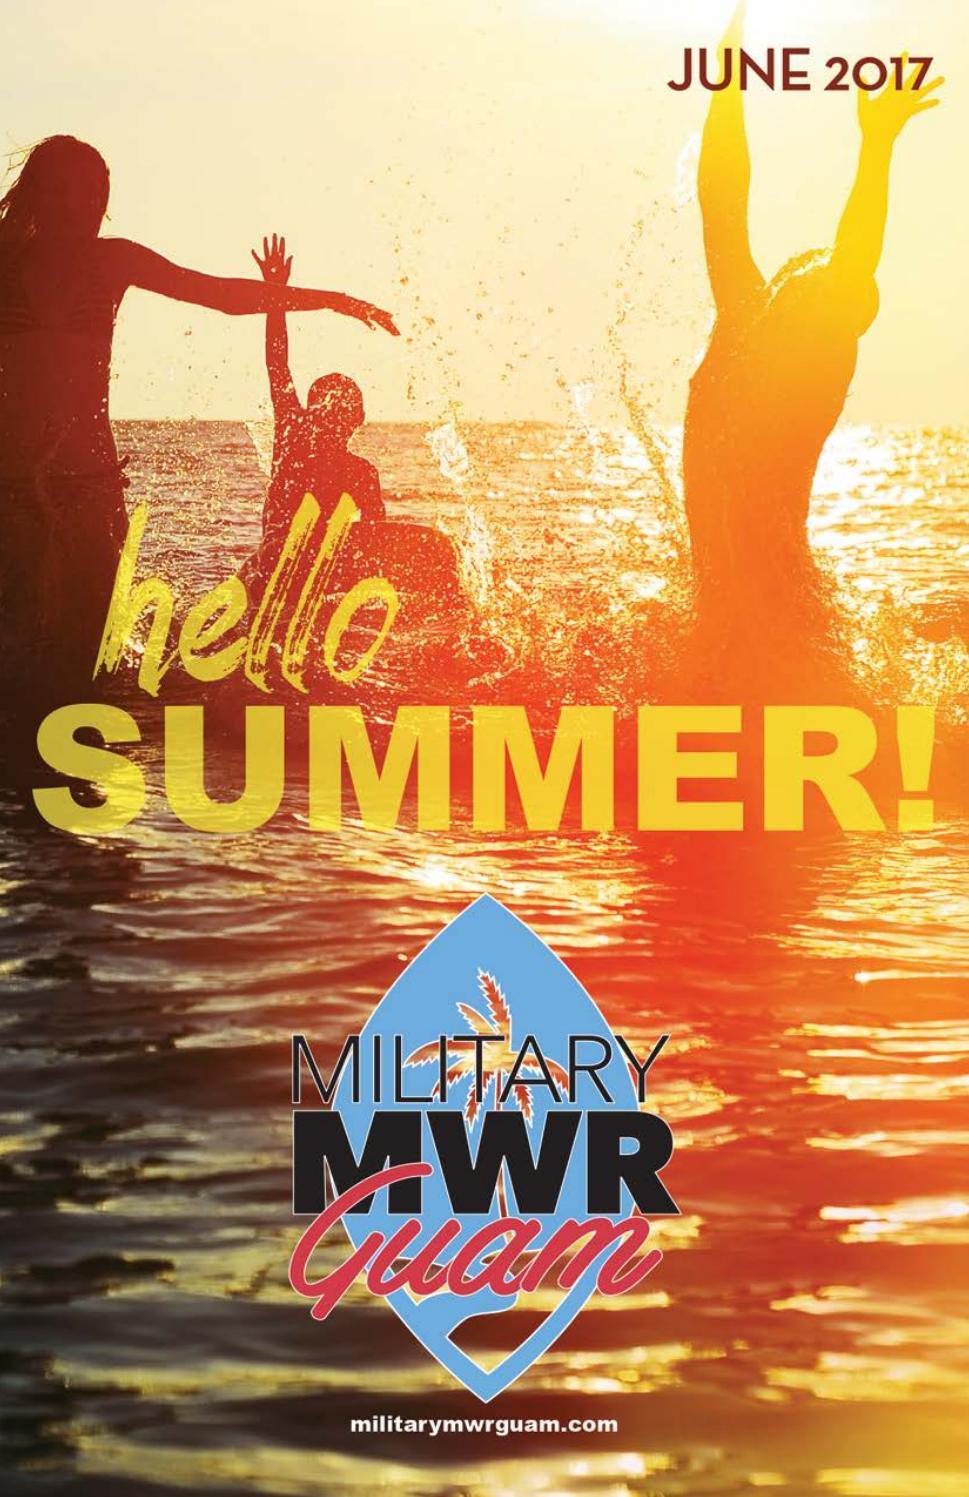 Military MWR Guam   June 2017 Edition By Joint Region Marianas Marketing    Issuu